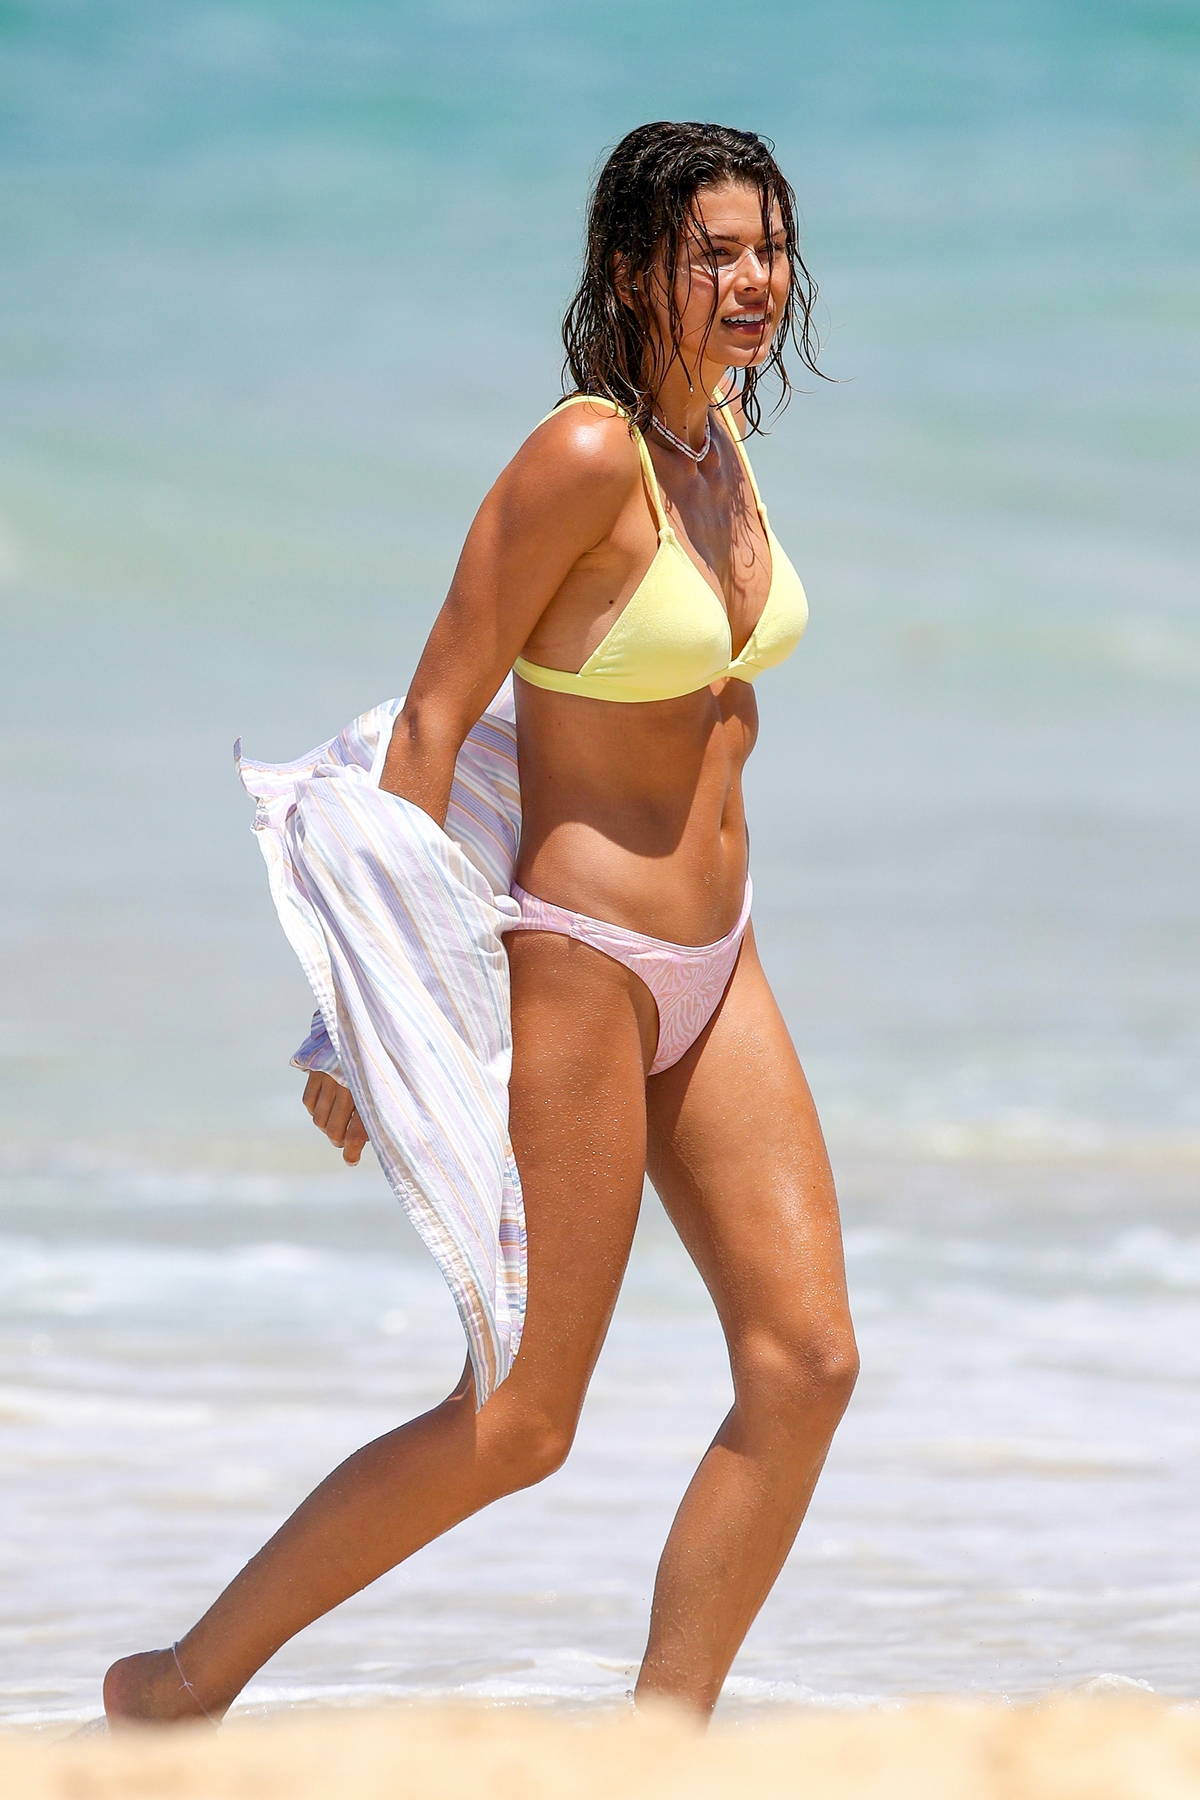 Georgia Fowler heats up the beach in yellow and pink bikini during a photoshoot at Bondi Beach, Sydney, Australia